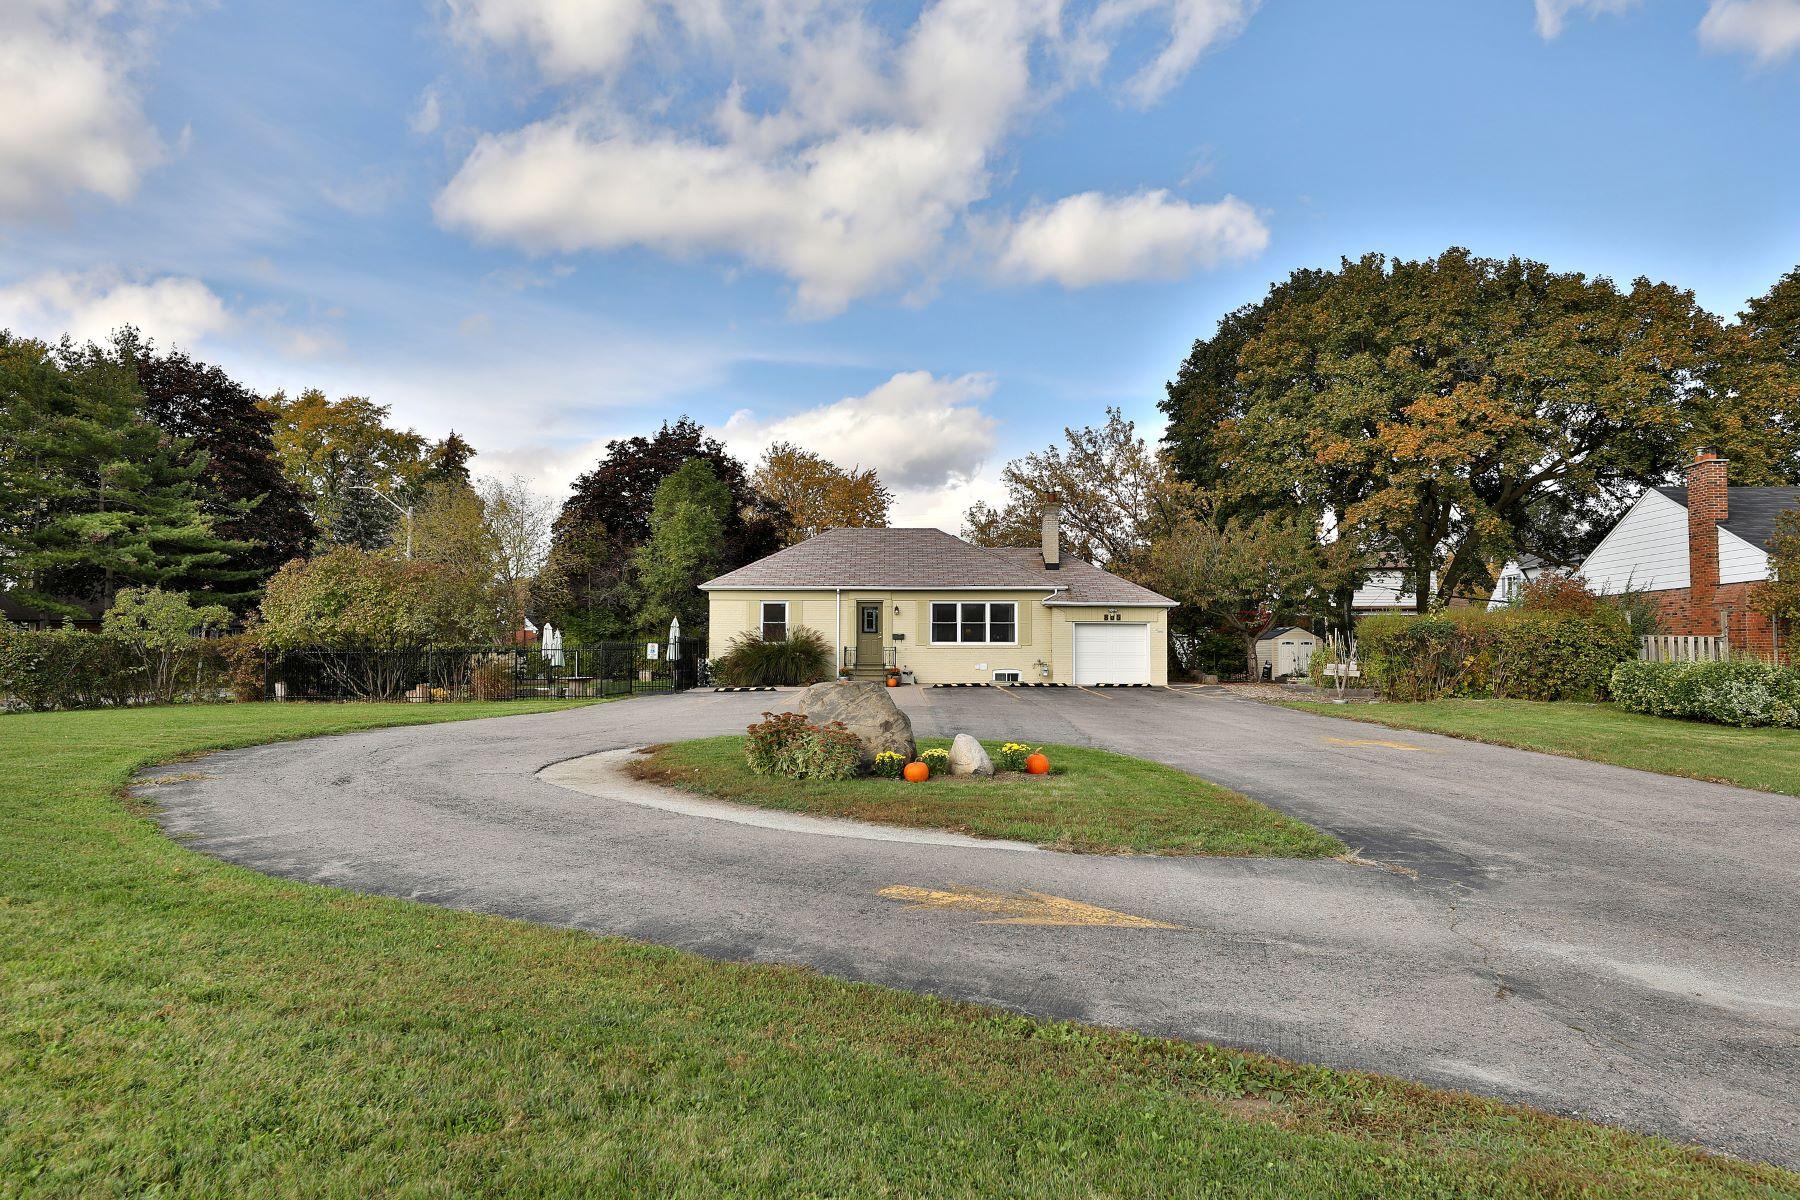 Maison unifamiliale pour l à vendre à Mississauga, Greater Toronto Area 805 North Service Rd, Mississauga, Ontario, L4Y1A2 Canada